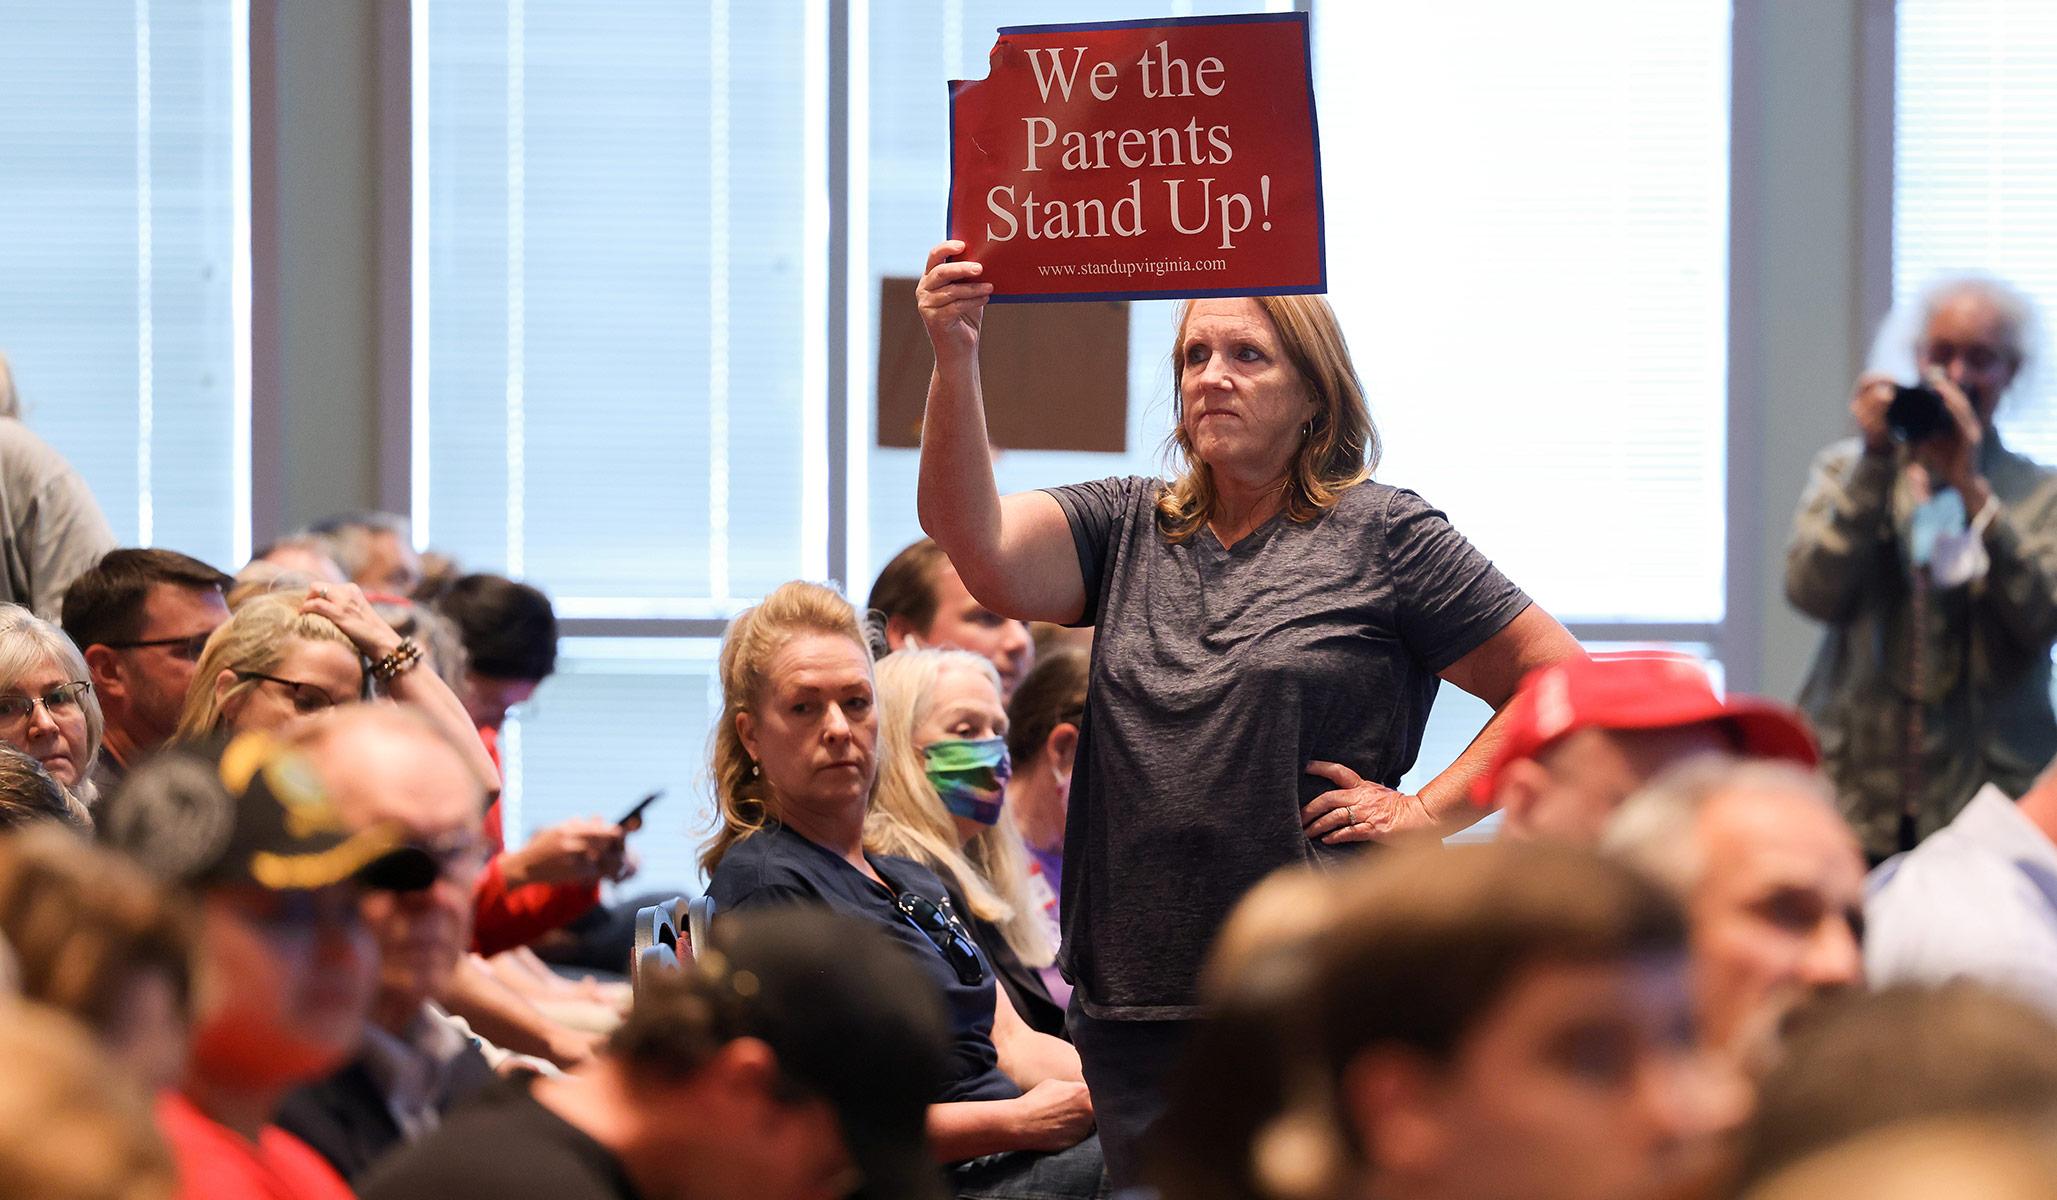 Ohio, Missouri, Pennsylvania School Board Groups Leave National Association over Letter Likening Parents to Domestic Terrorists